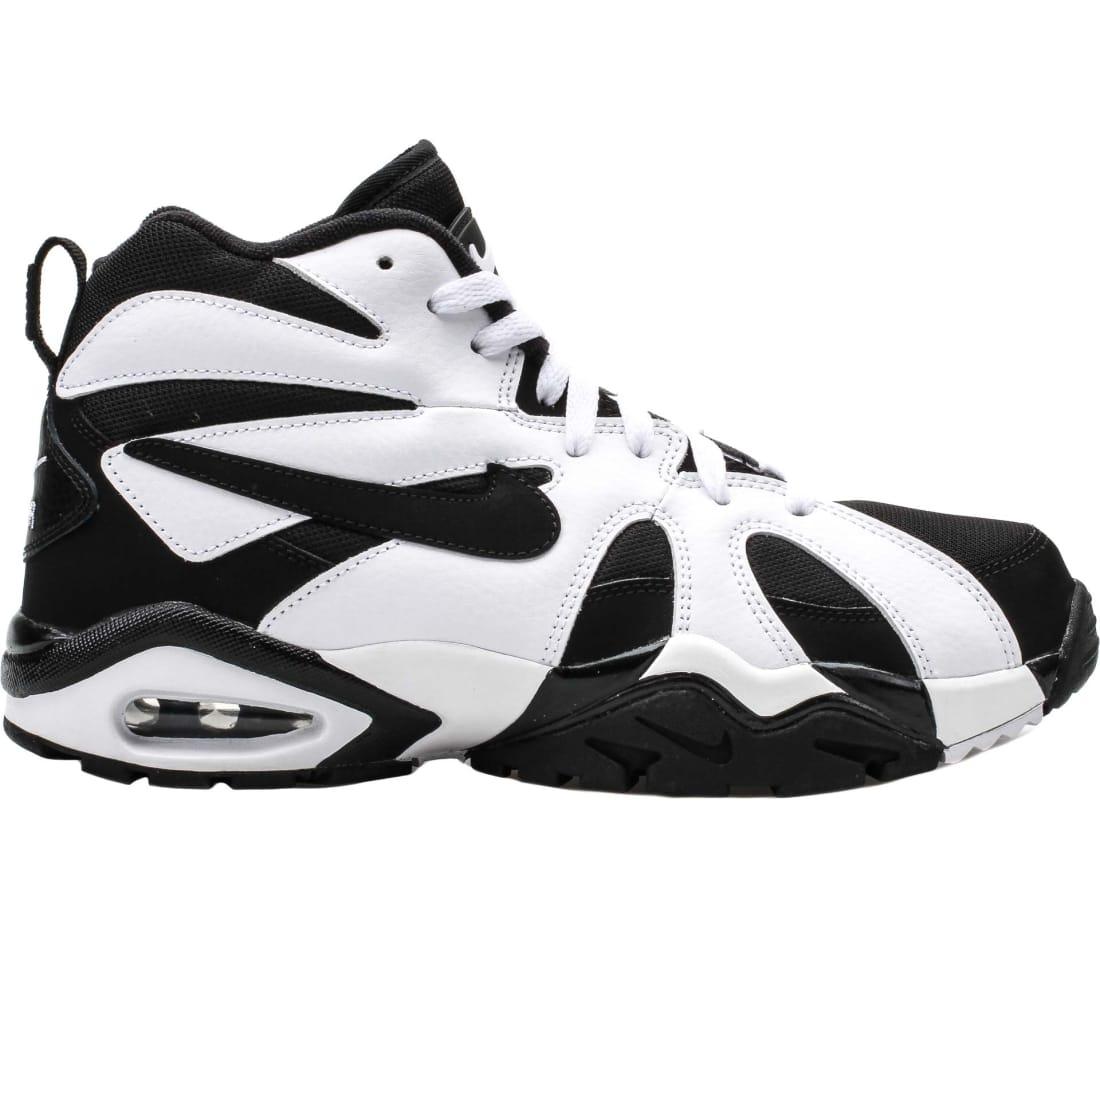 online store 14bb5 b4ca8 Nike · Nike Air Griffey. Nike Air Diamond Fury 96